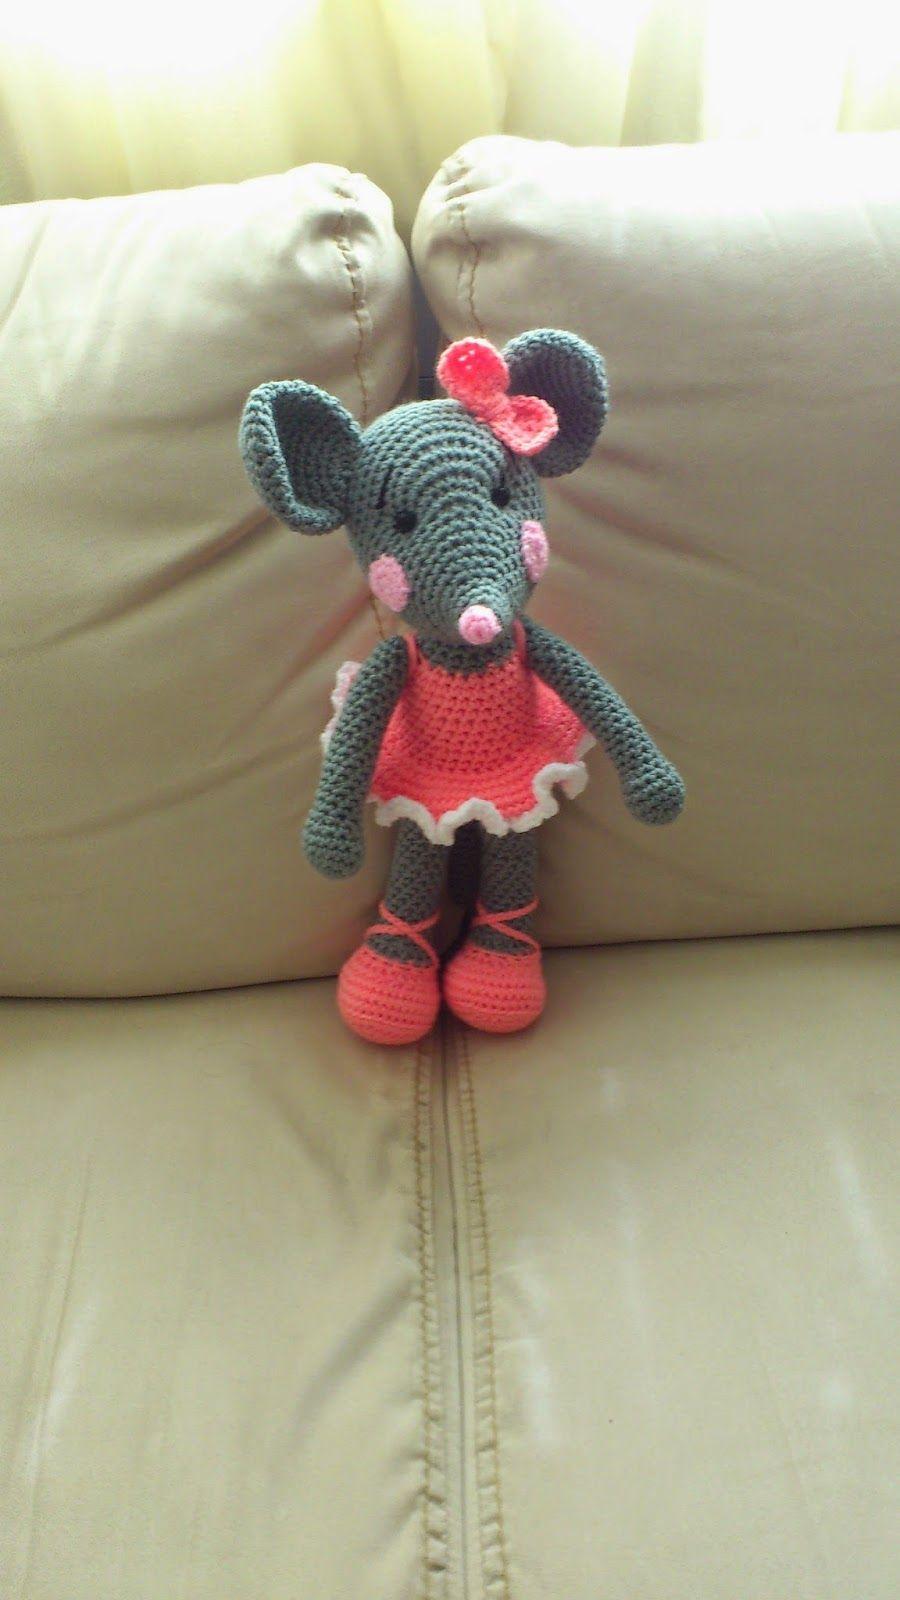 Amigurumi Ballerina Rat - FREE Crochet Pattern / Tutorial | FREE ...